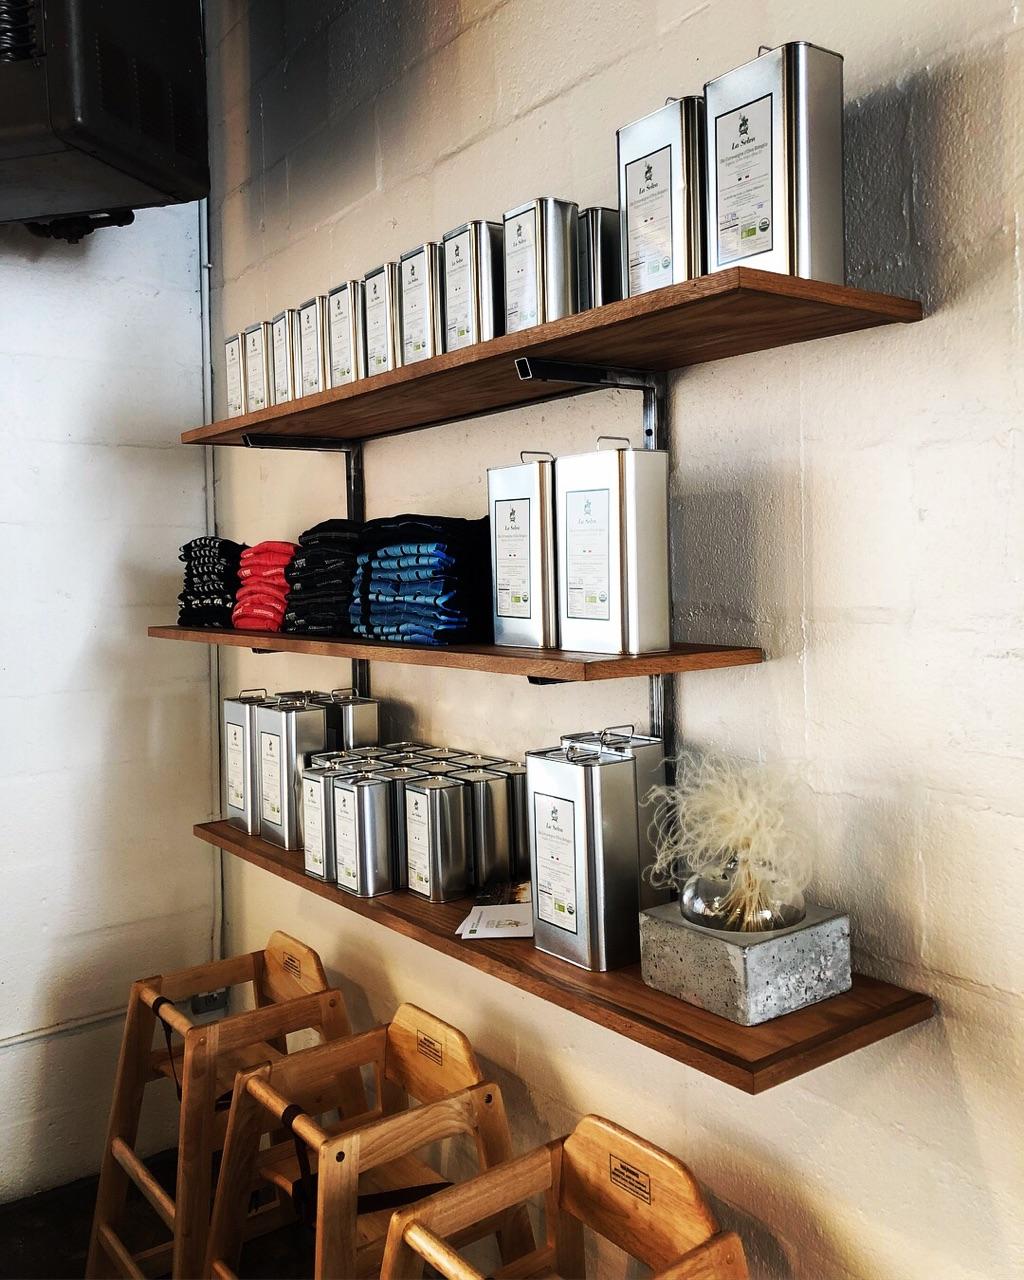 steel and wood display shelves